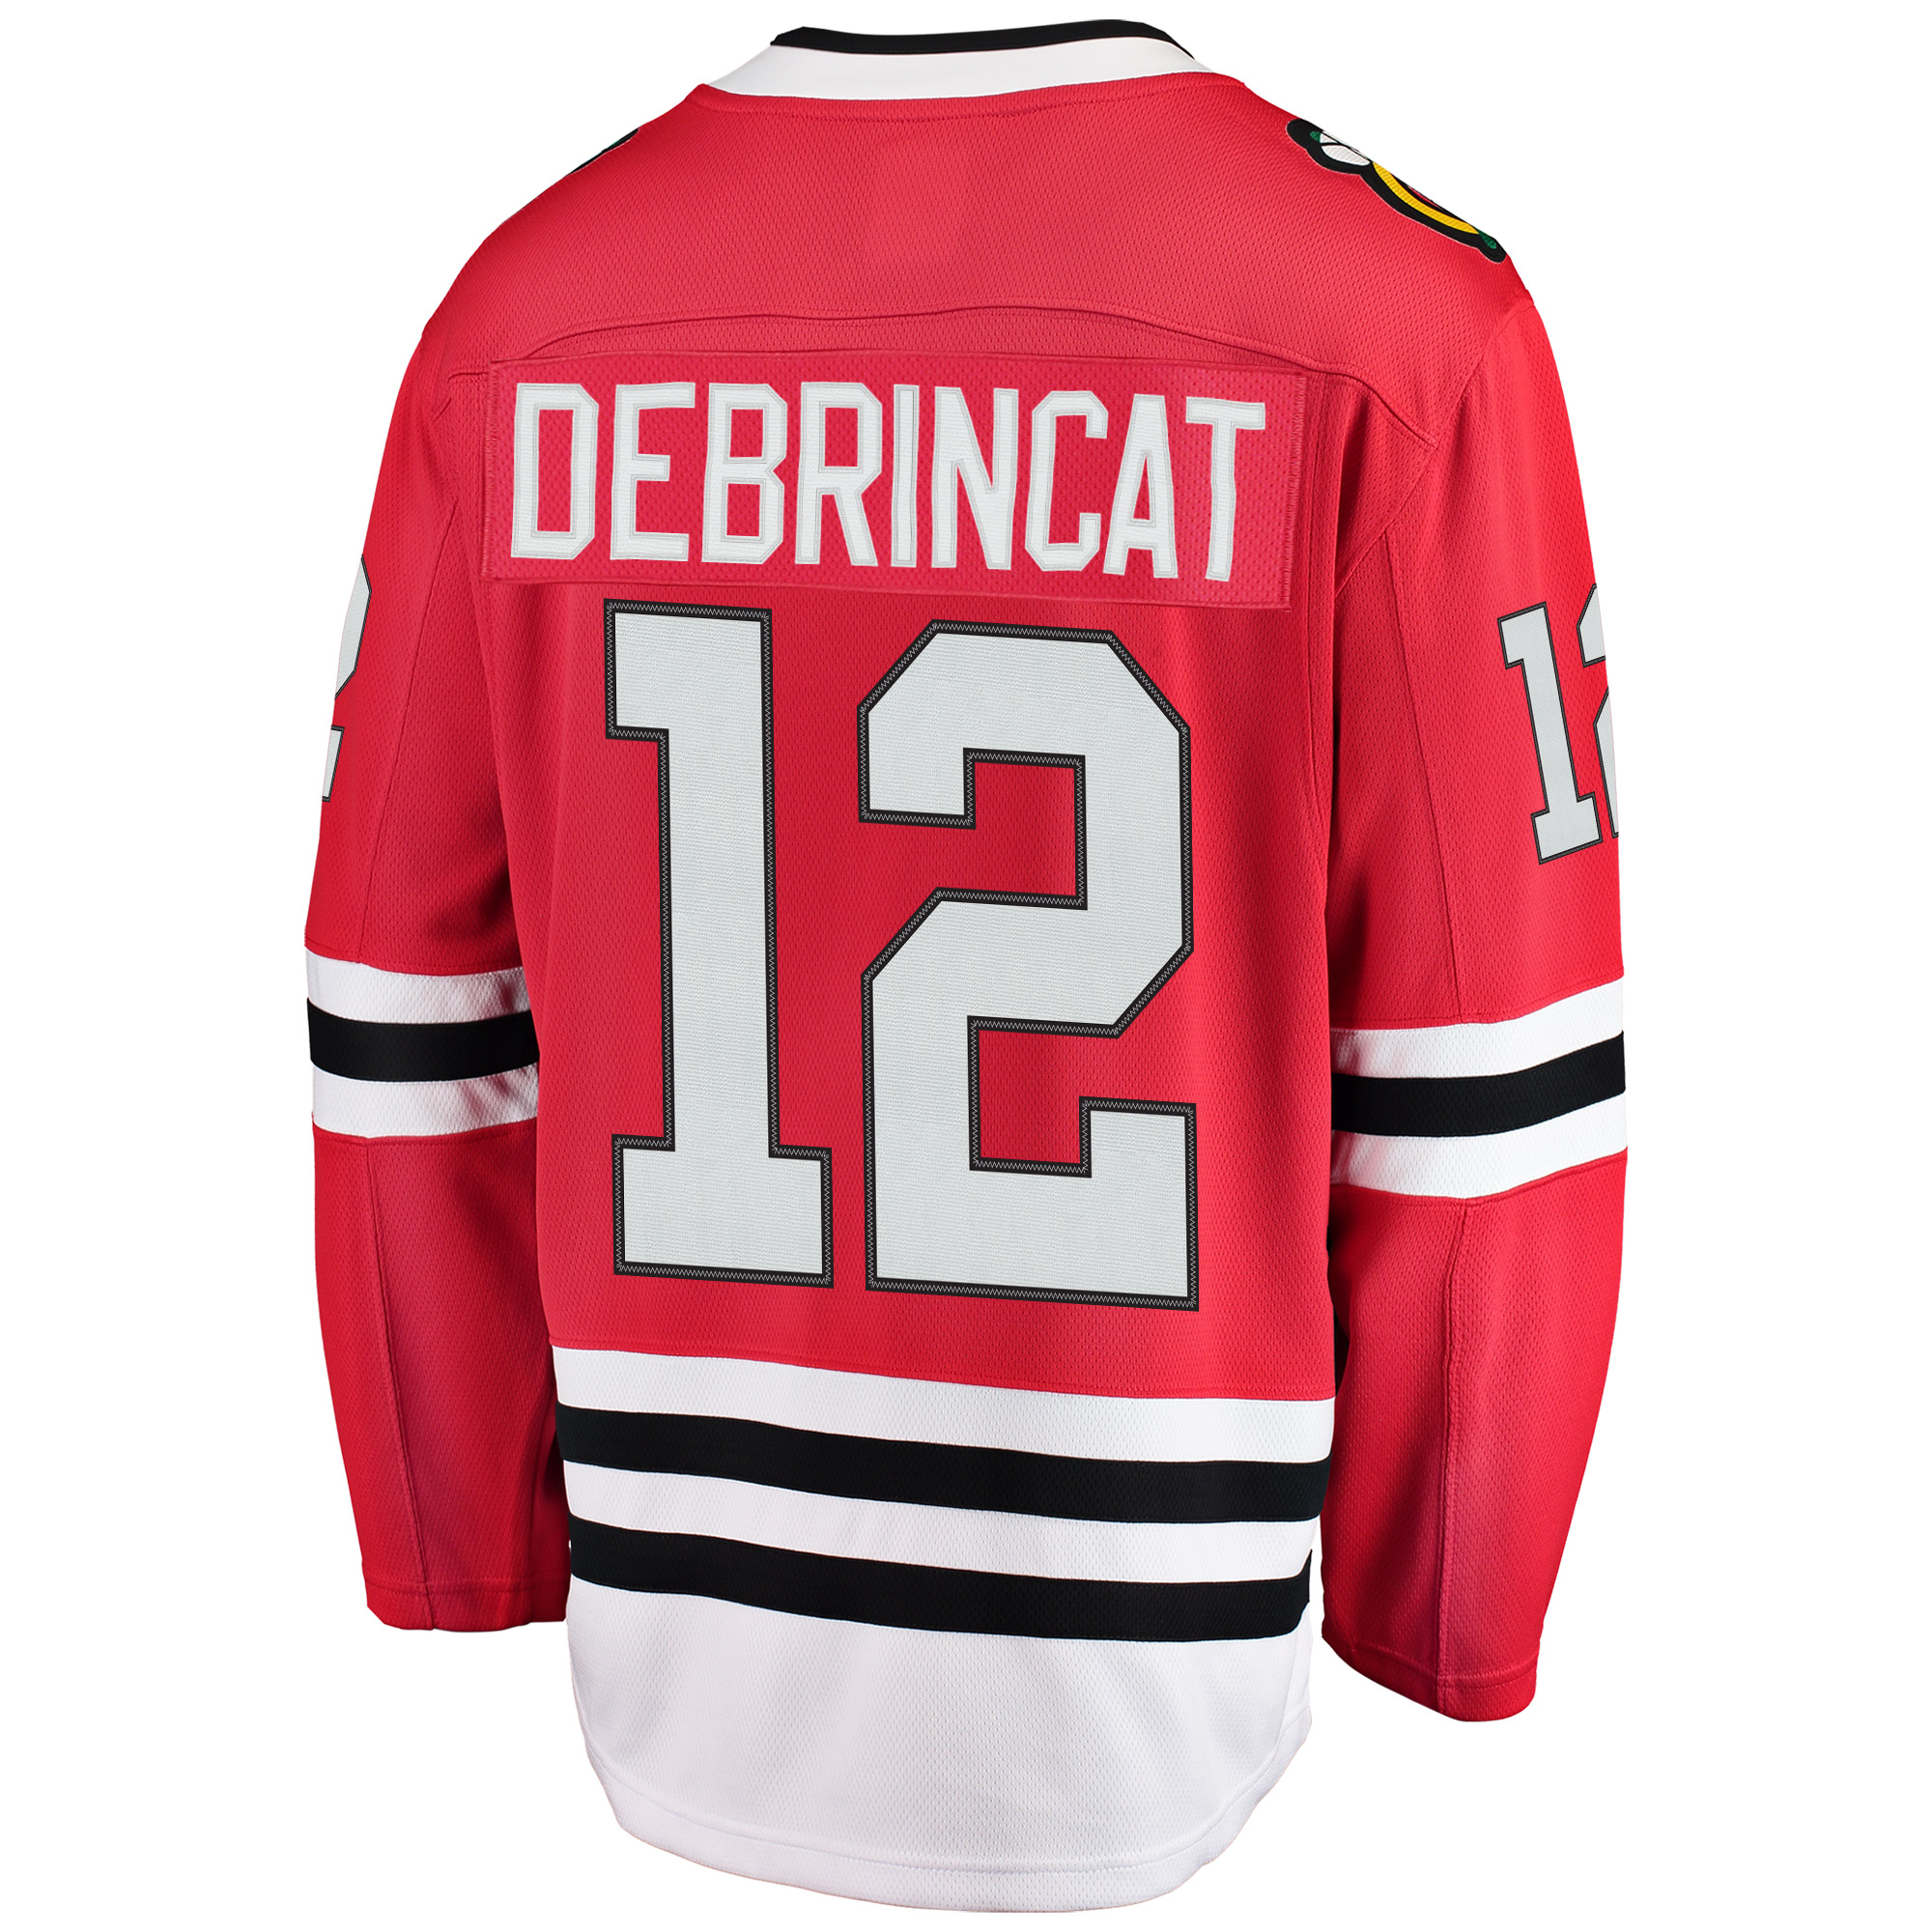 Alex DeBrincat Chicago Blackhawks Winter Classic Player Jersey